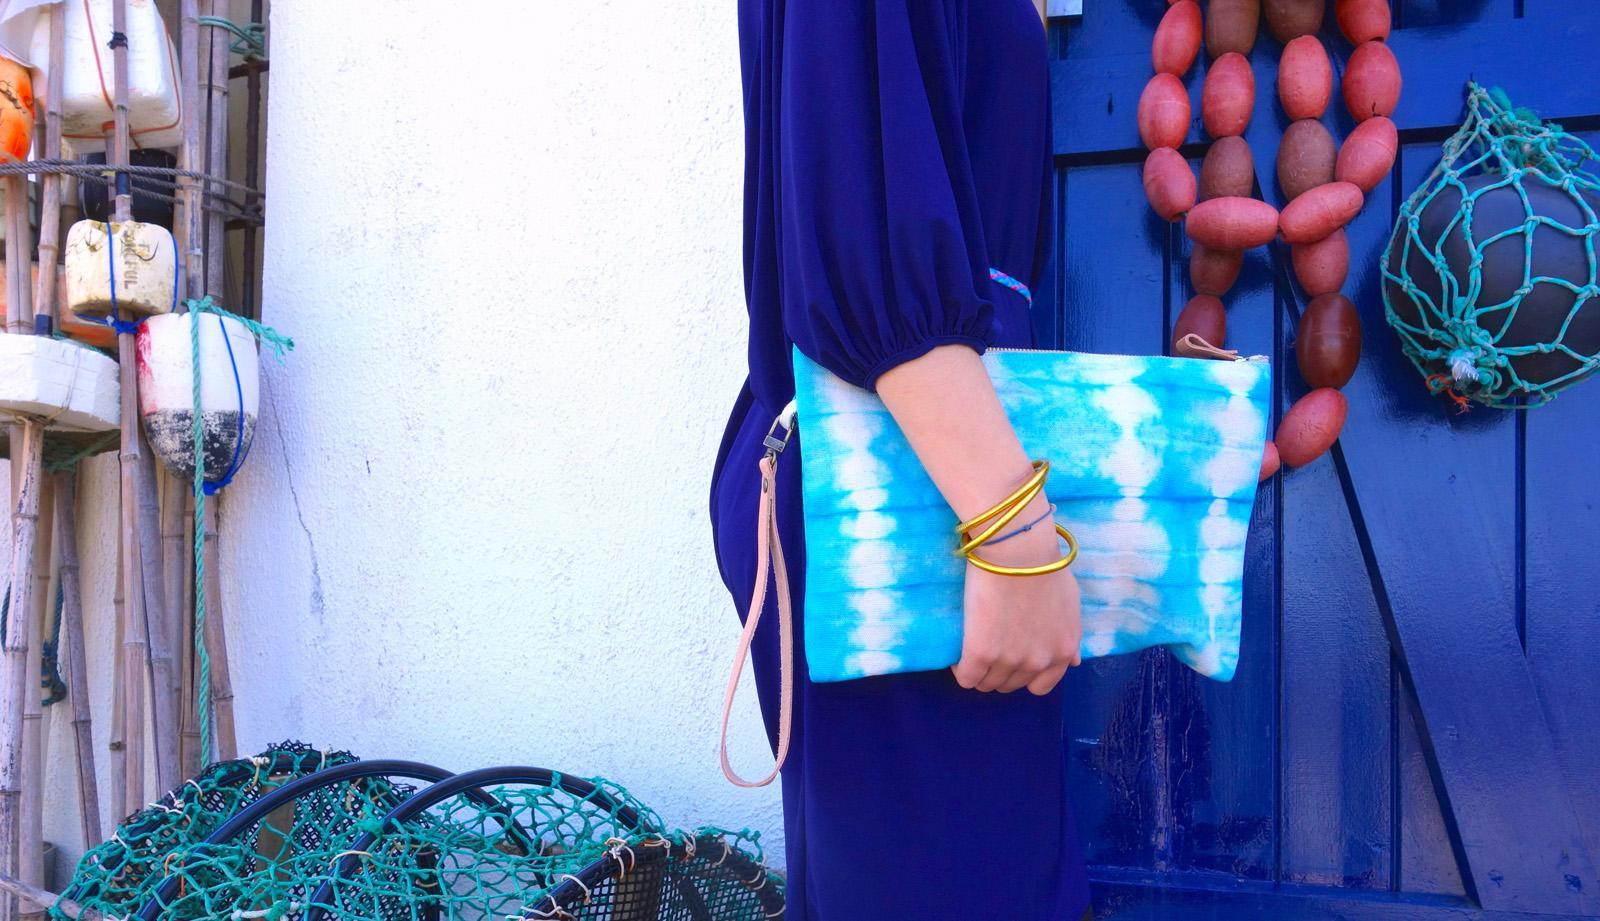 Pochette St Tropez XL mini sac trousse de voyage ty and die turquoise bleu outremer anse cuir